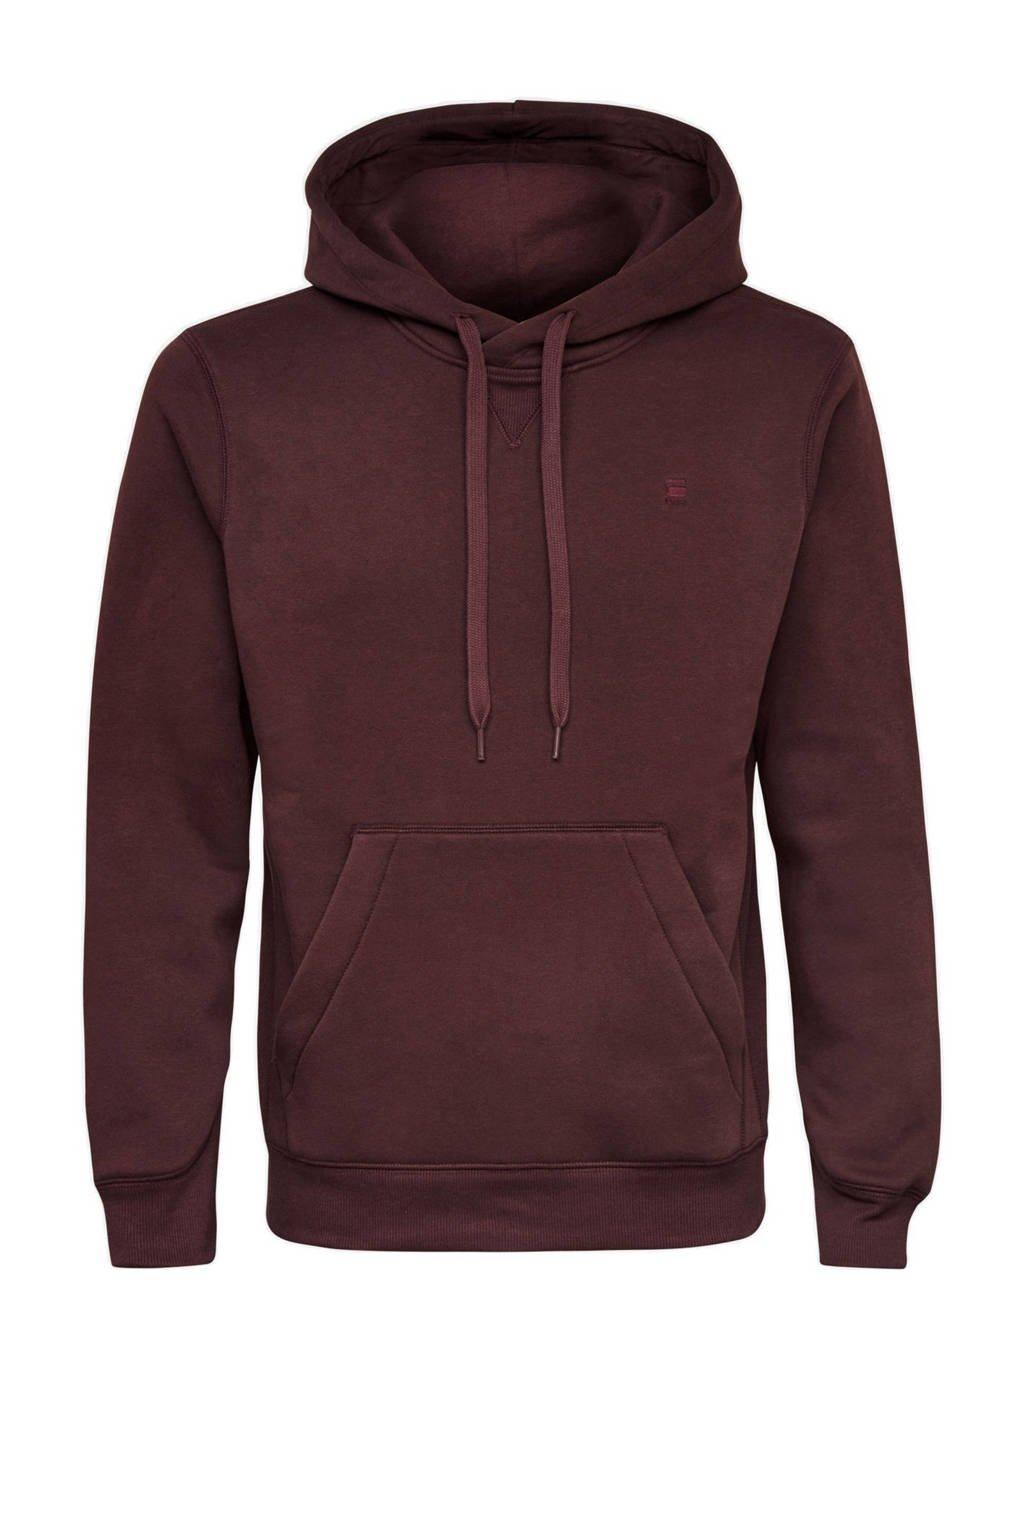 G-Star RAW hoodie donkerrood, Donkerrood